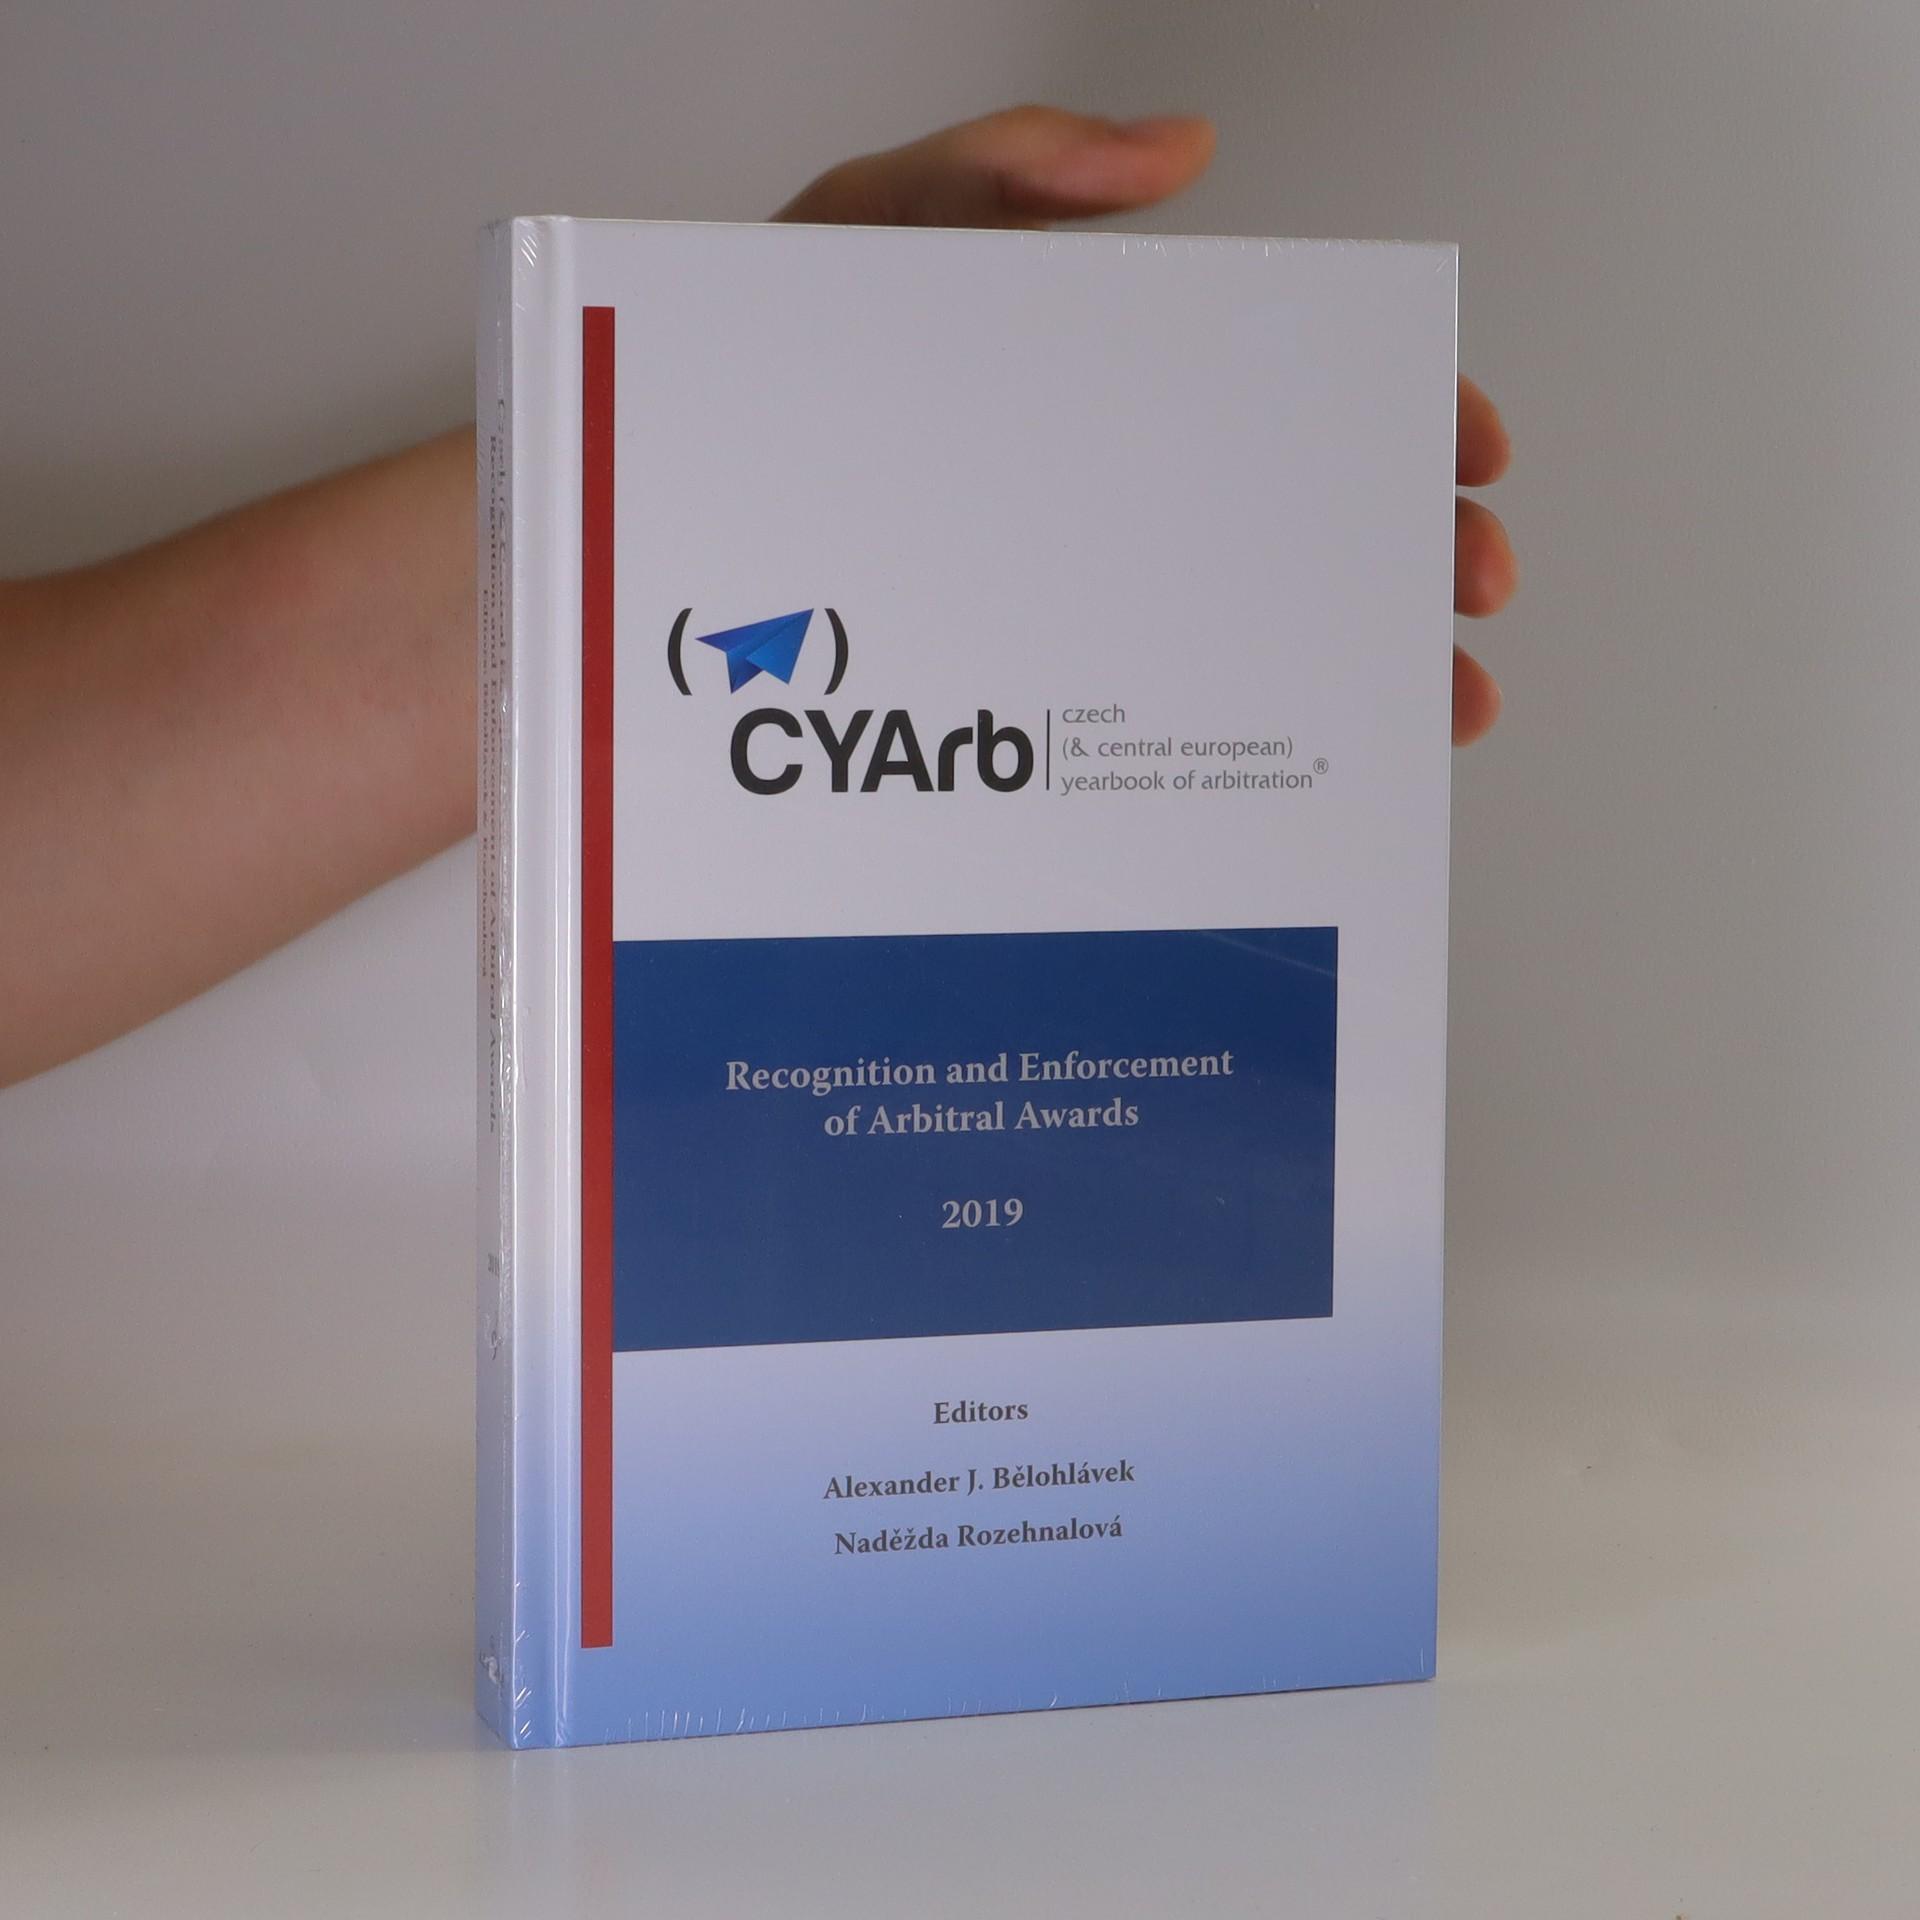 antikvární kniha Recognition and enforcement of arbitral awards, 2019